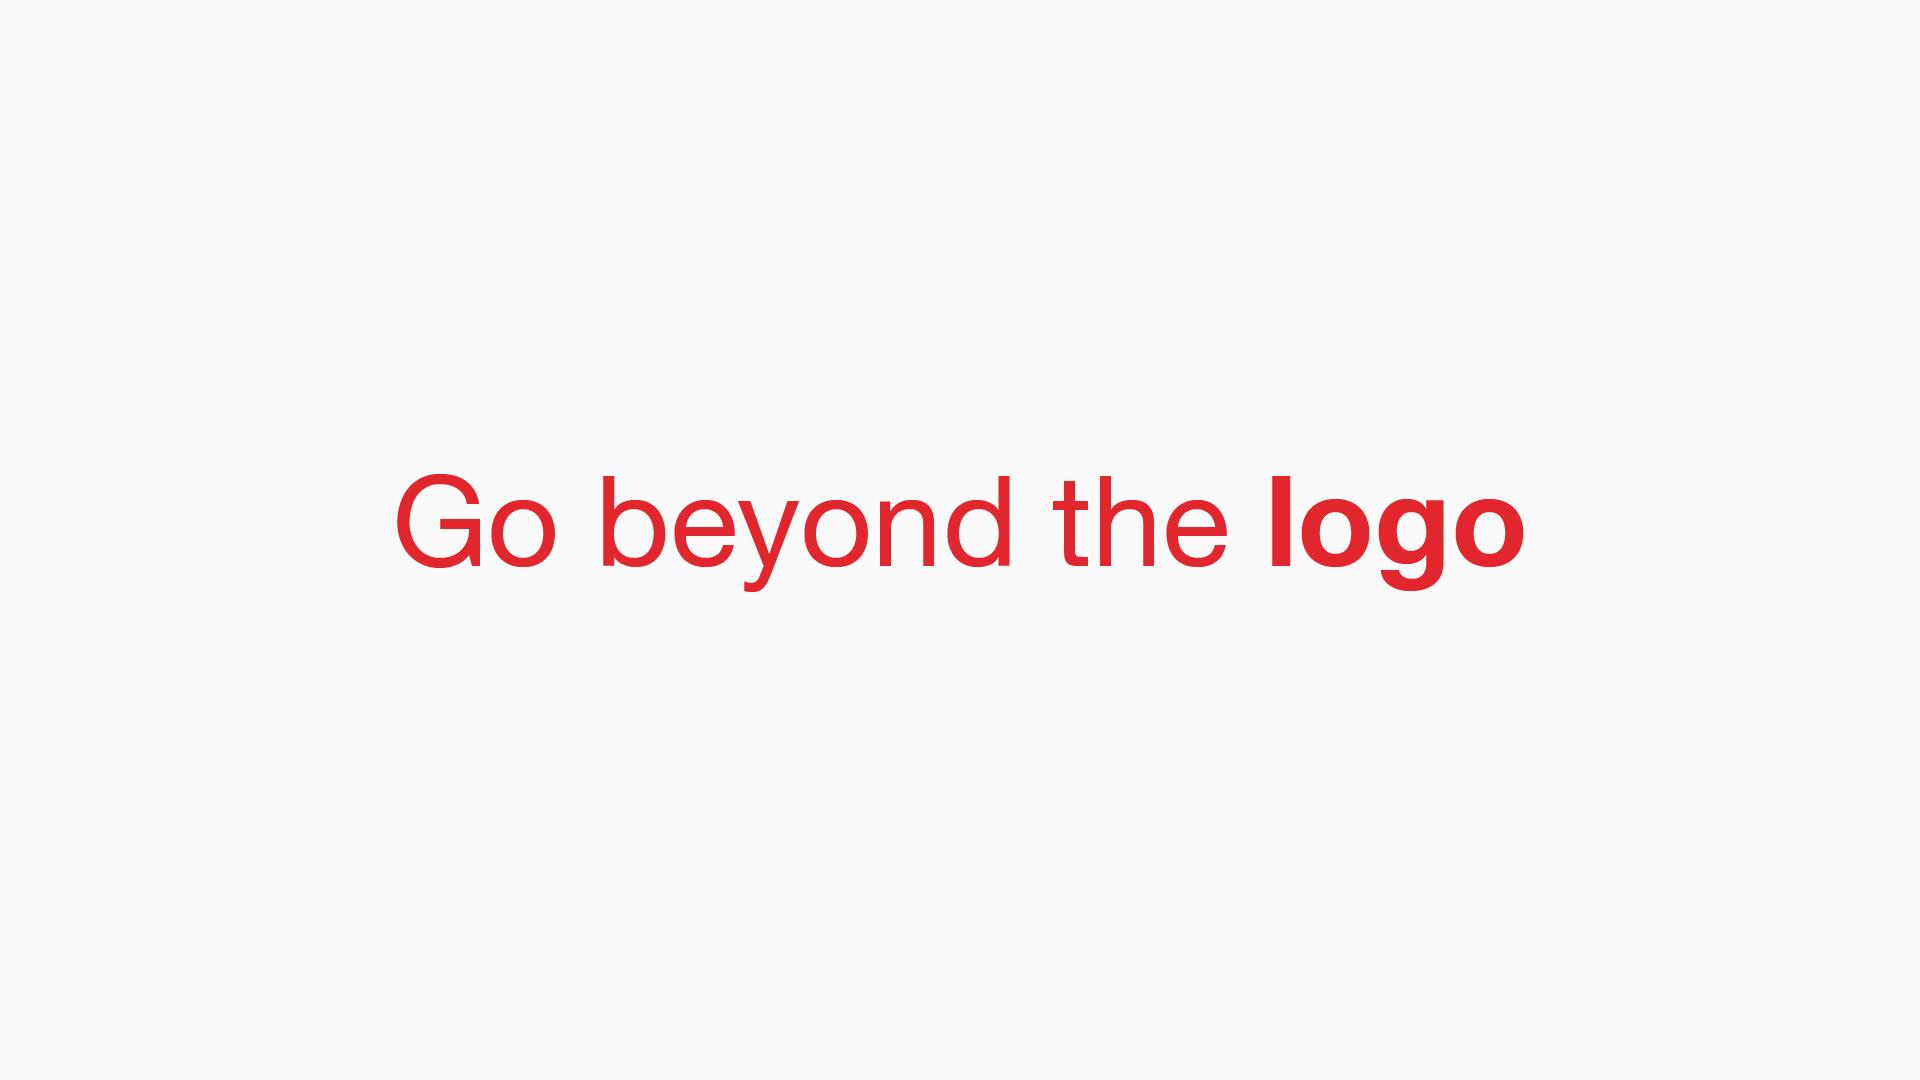 Go beyond the logo - Manraj Ubhi